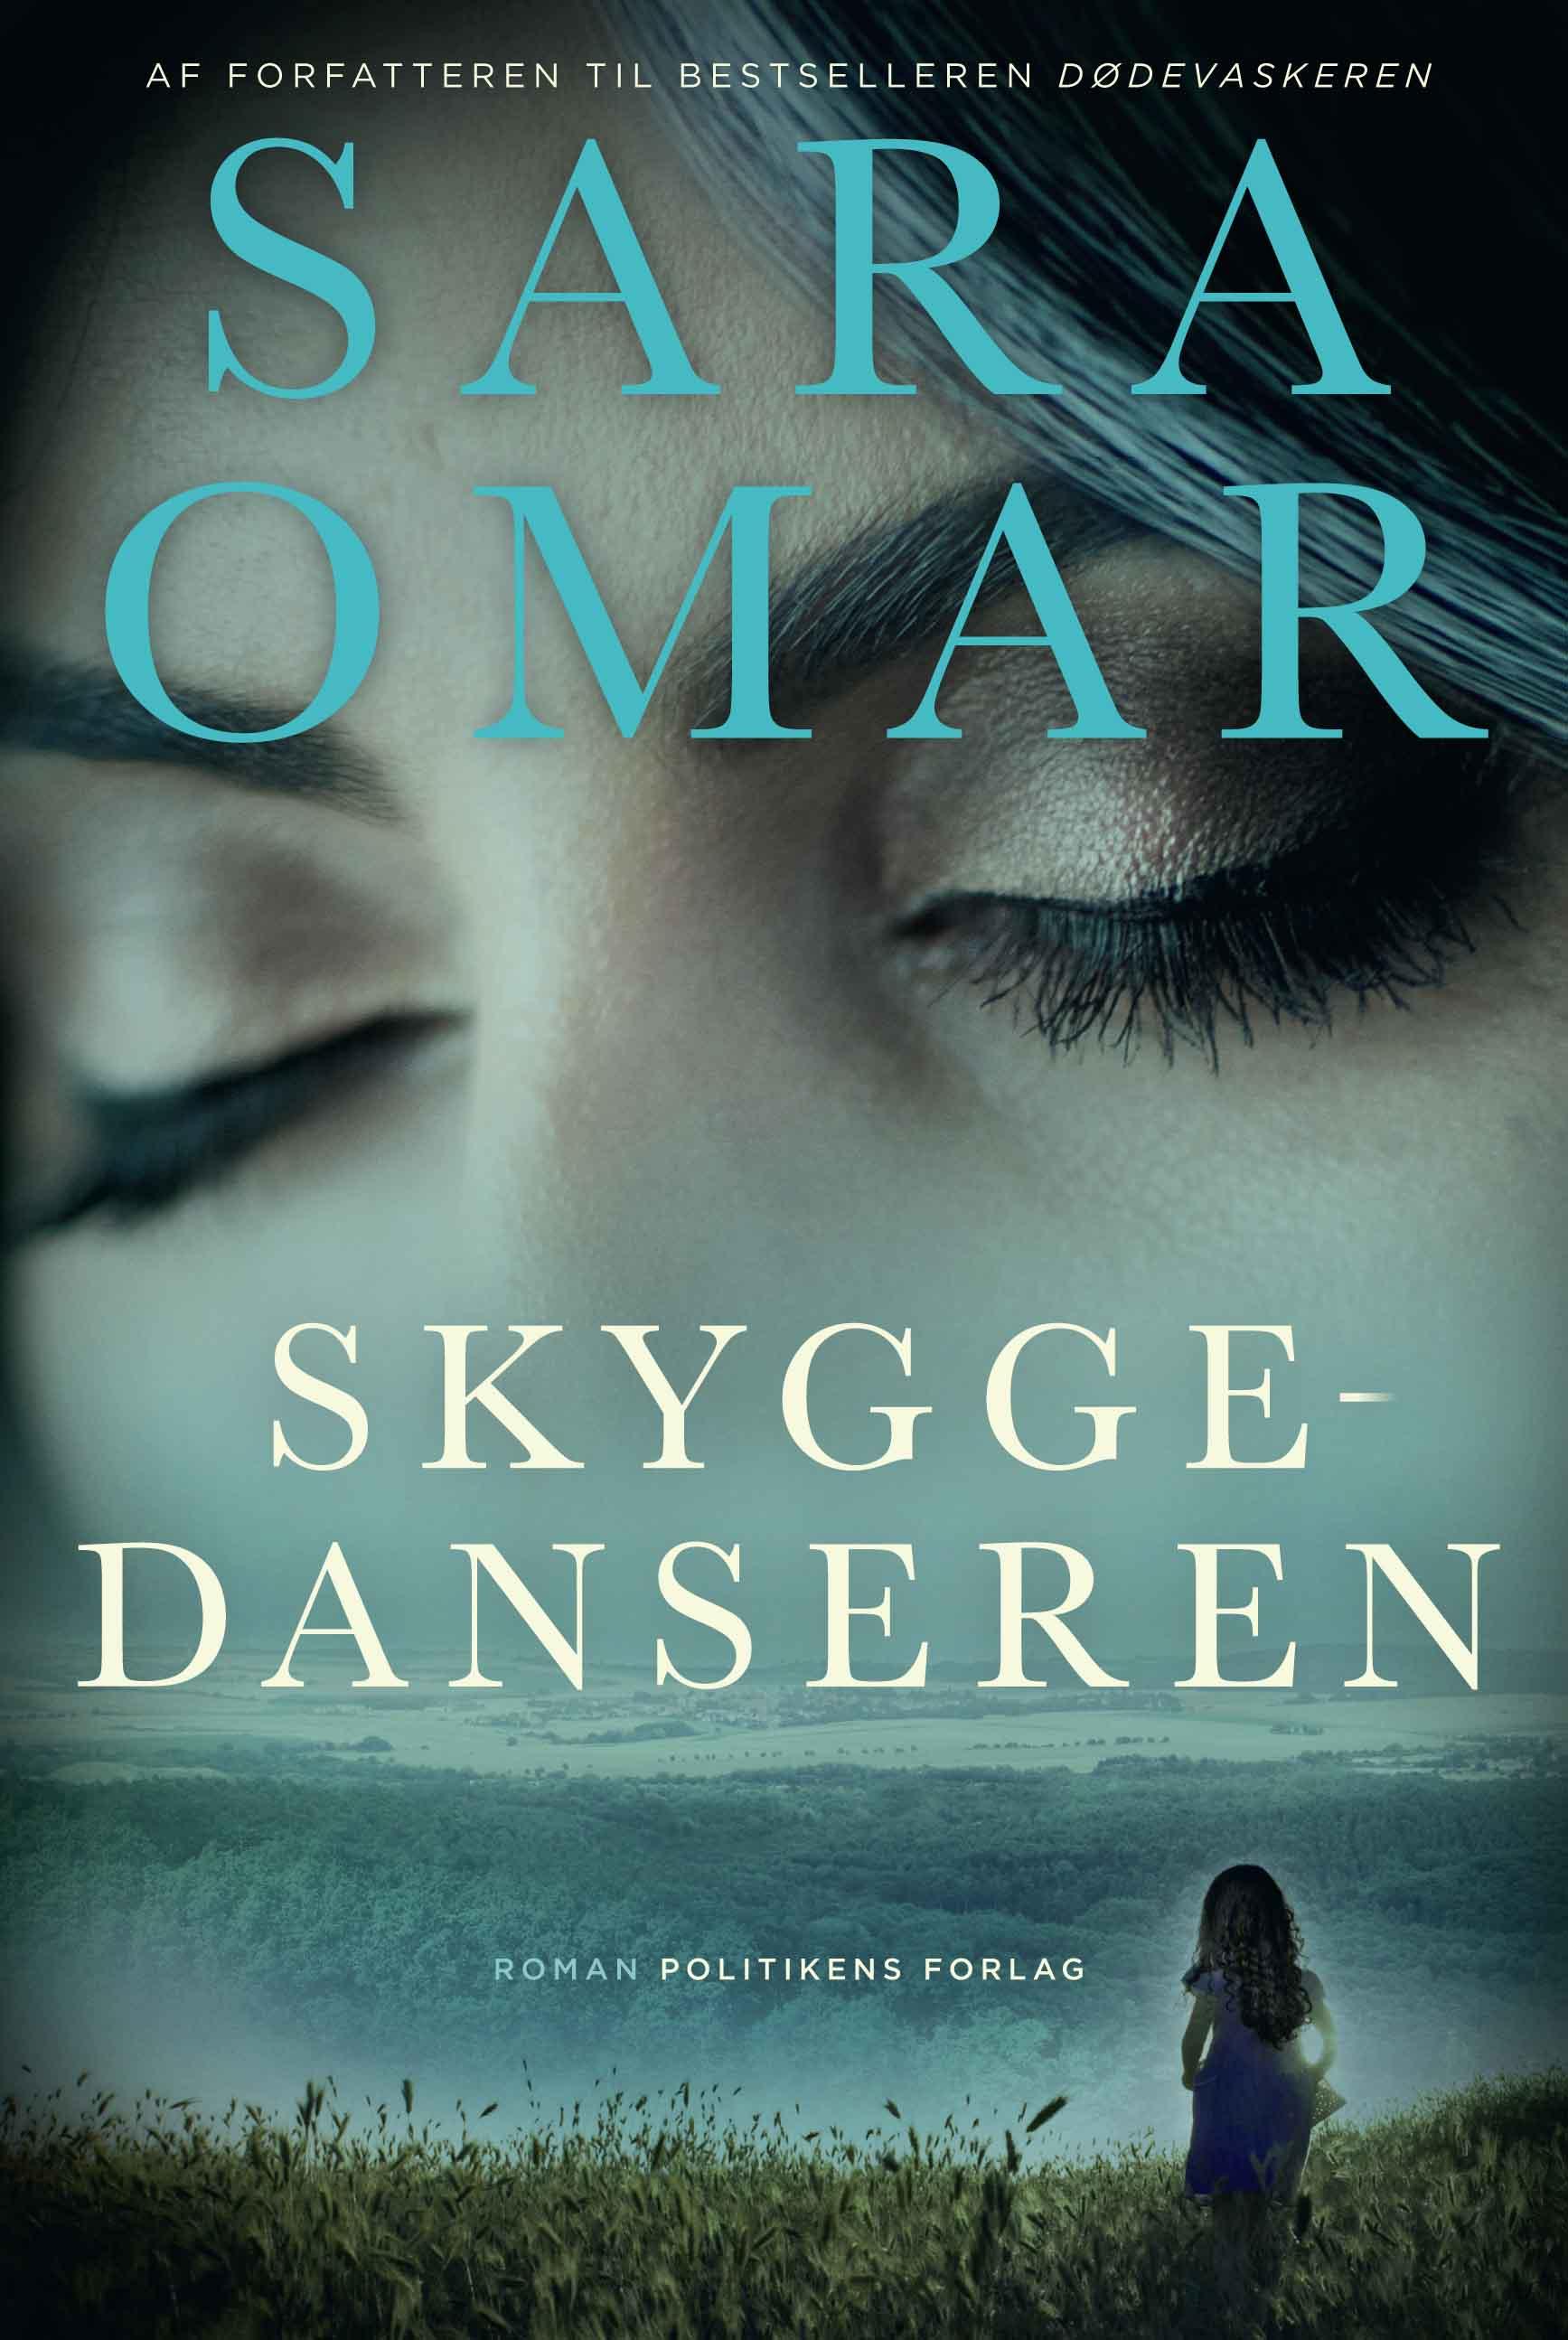 Skyggedanseren - Sara Omar - Bøger - Politikens Forlag - 9788740059243 - 25/3-2020